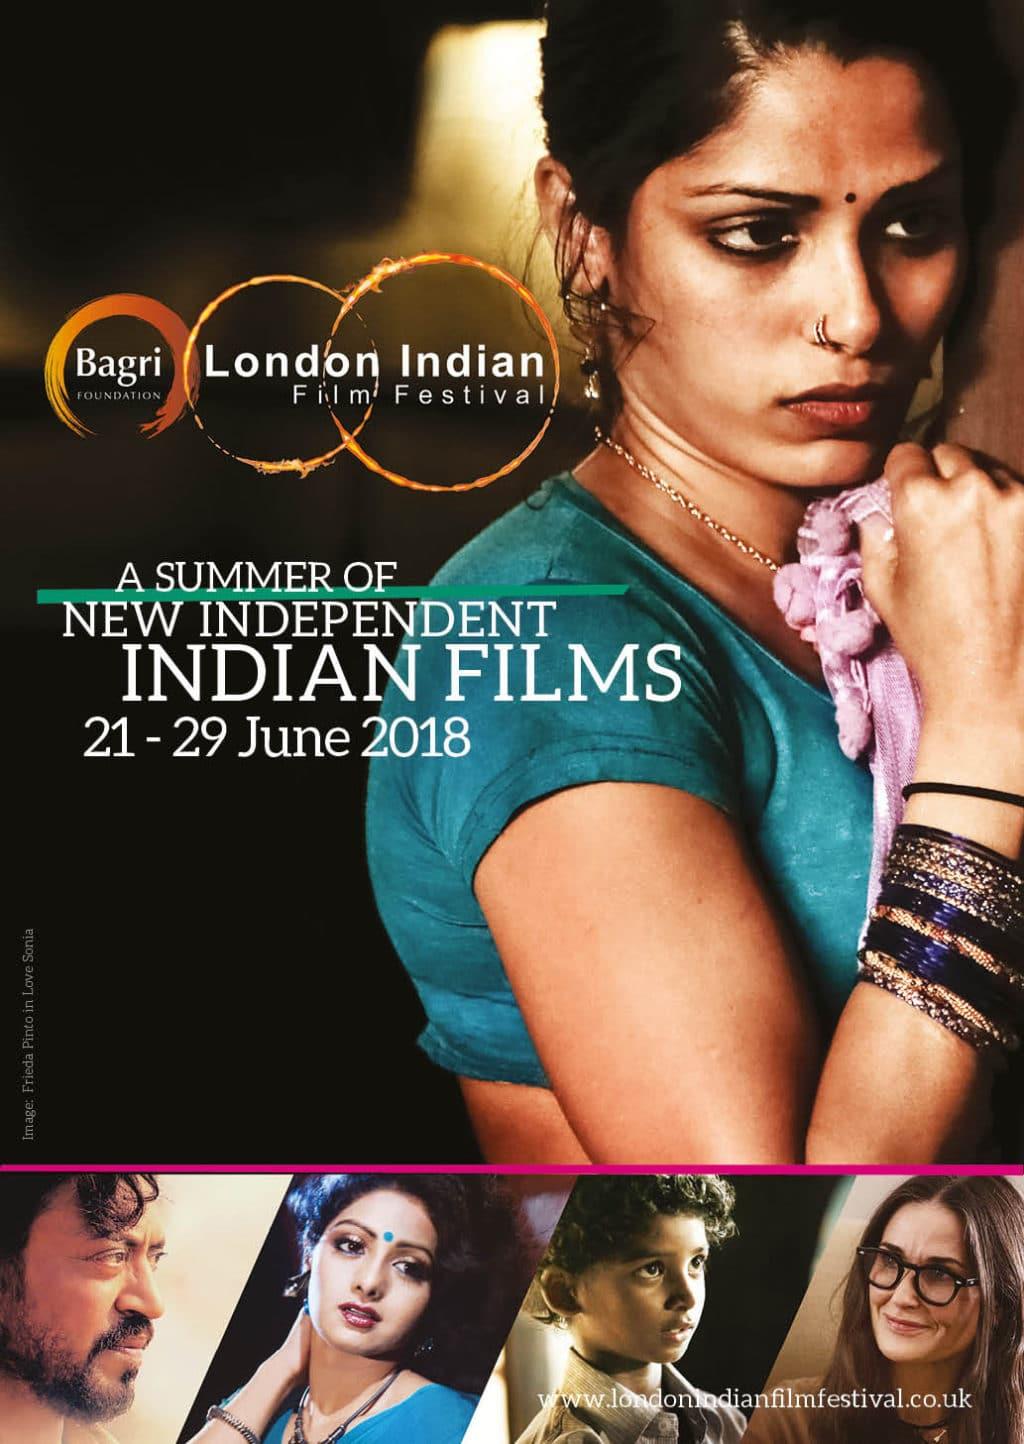 Bagri Foundation London Indian Film Festival 2018 Bagri Foundation